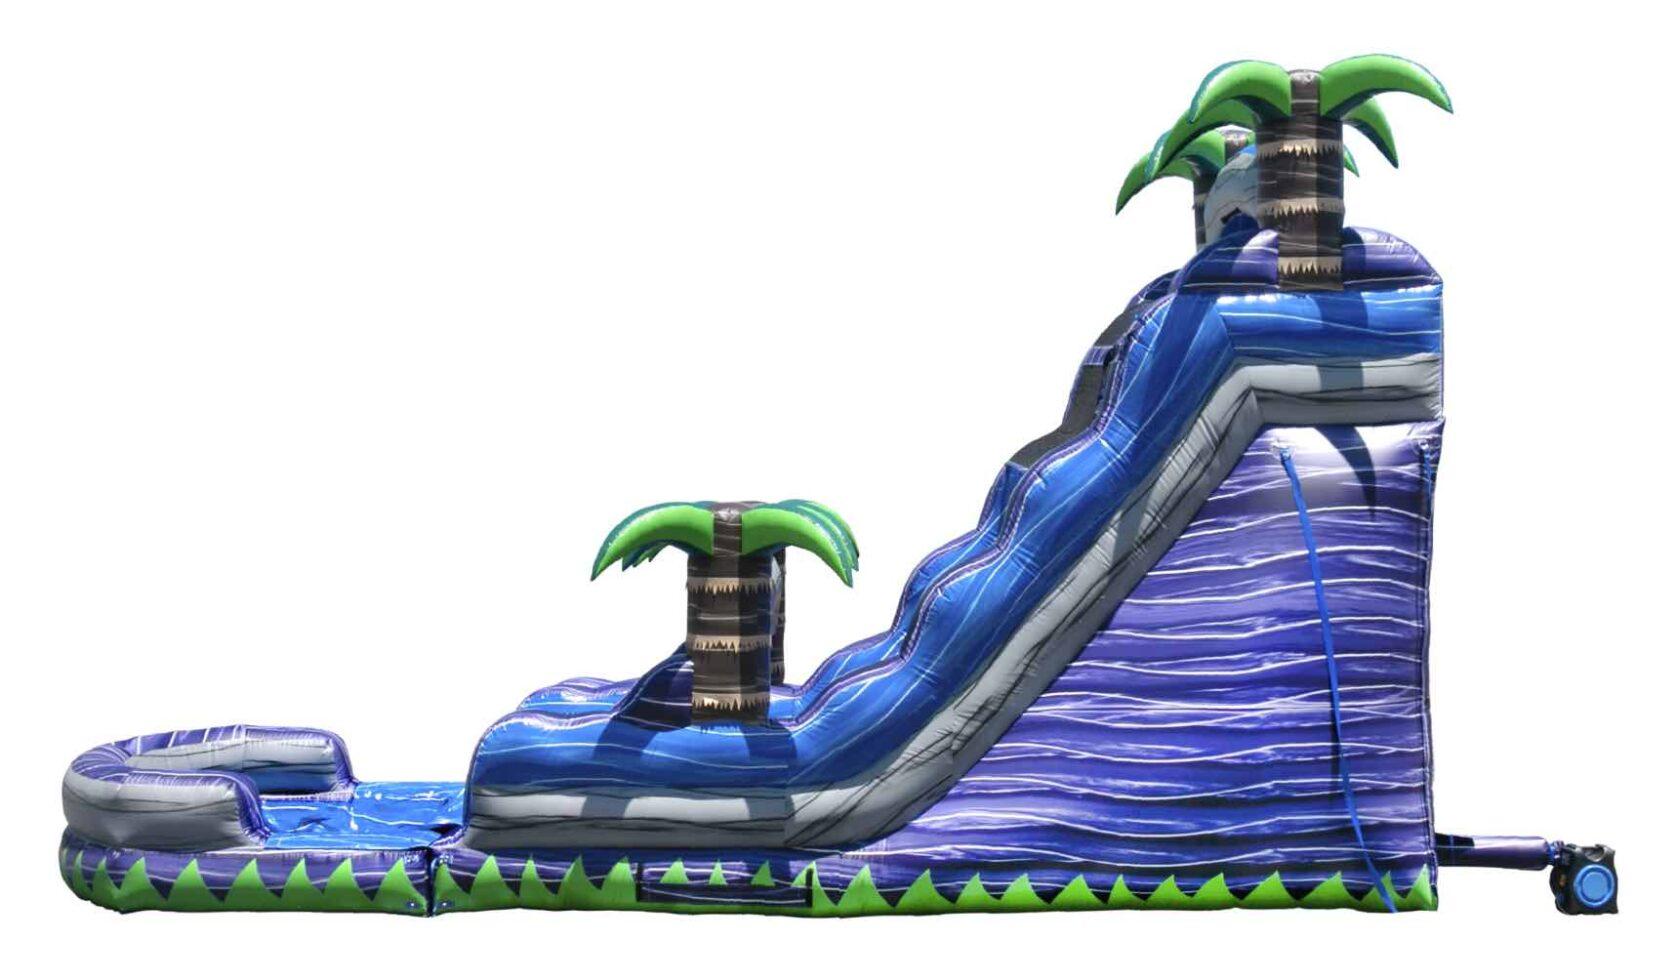 Purple Crush Inflatable Water Slide Rental Grand Rapids